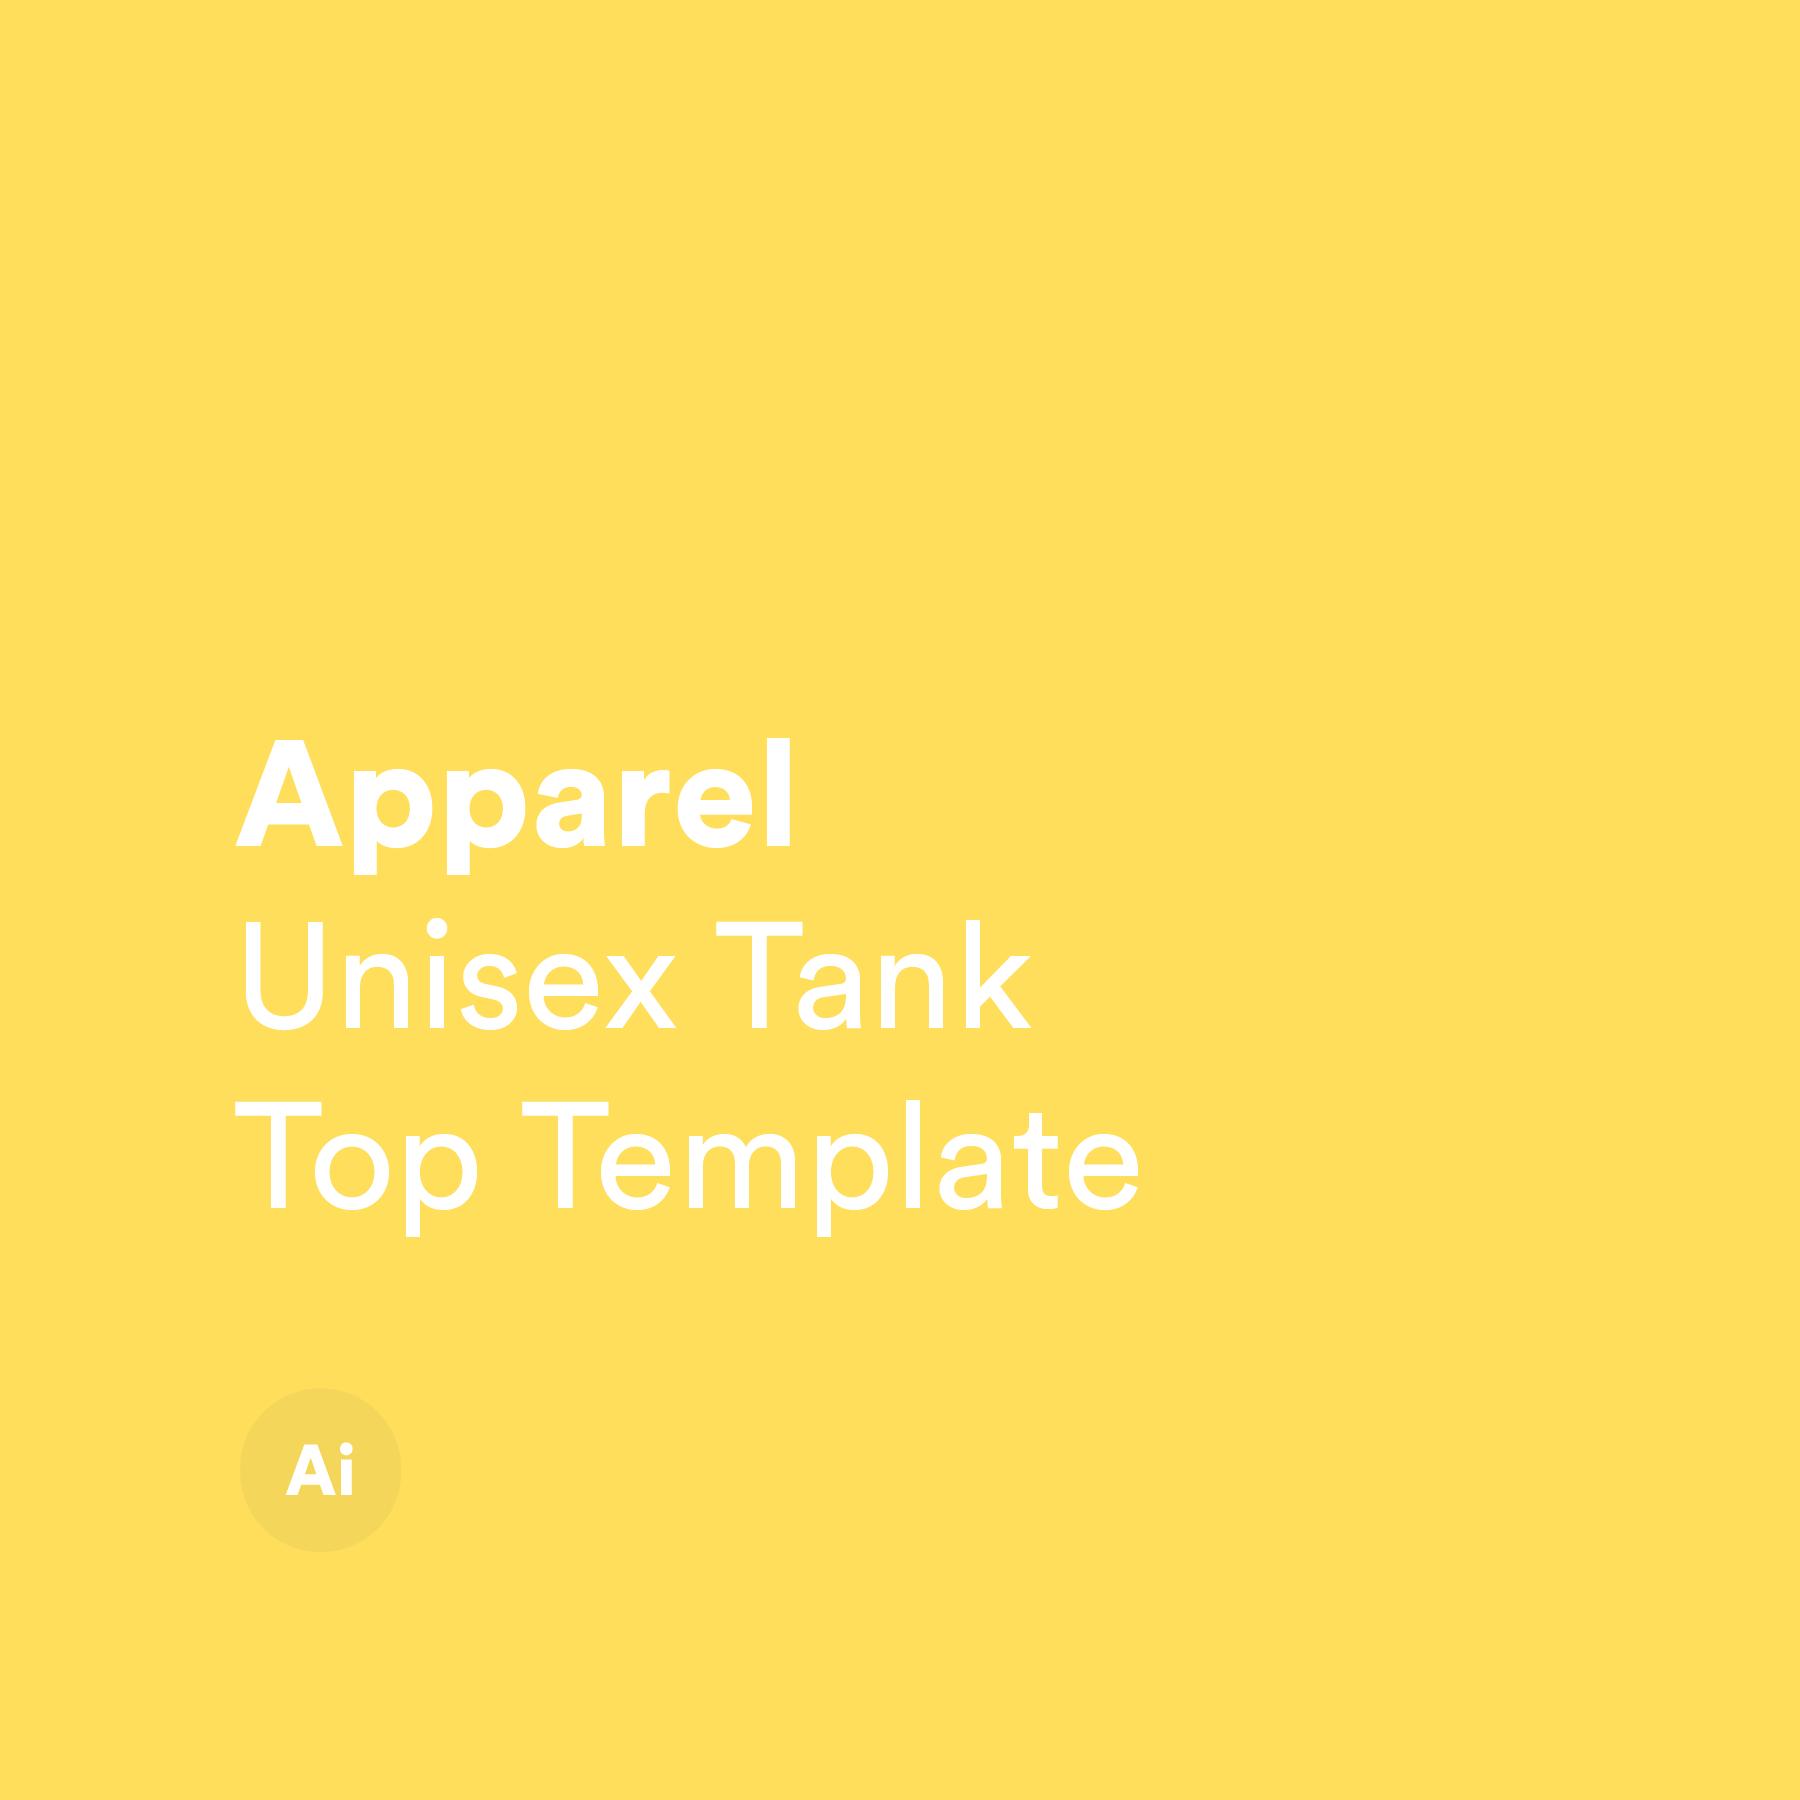 Unisex Tank Top Template